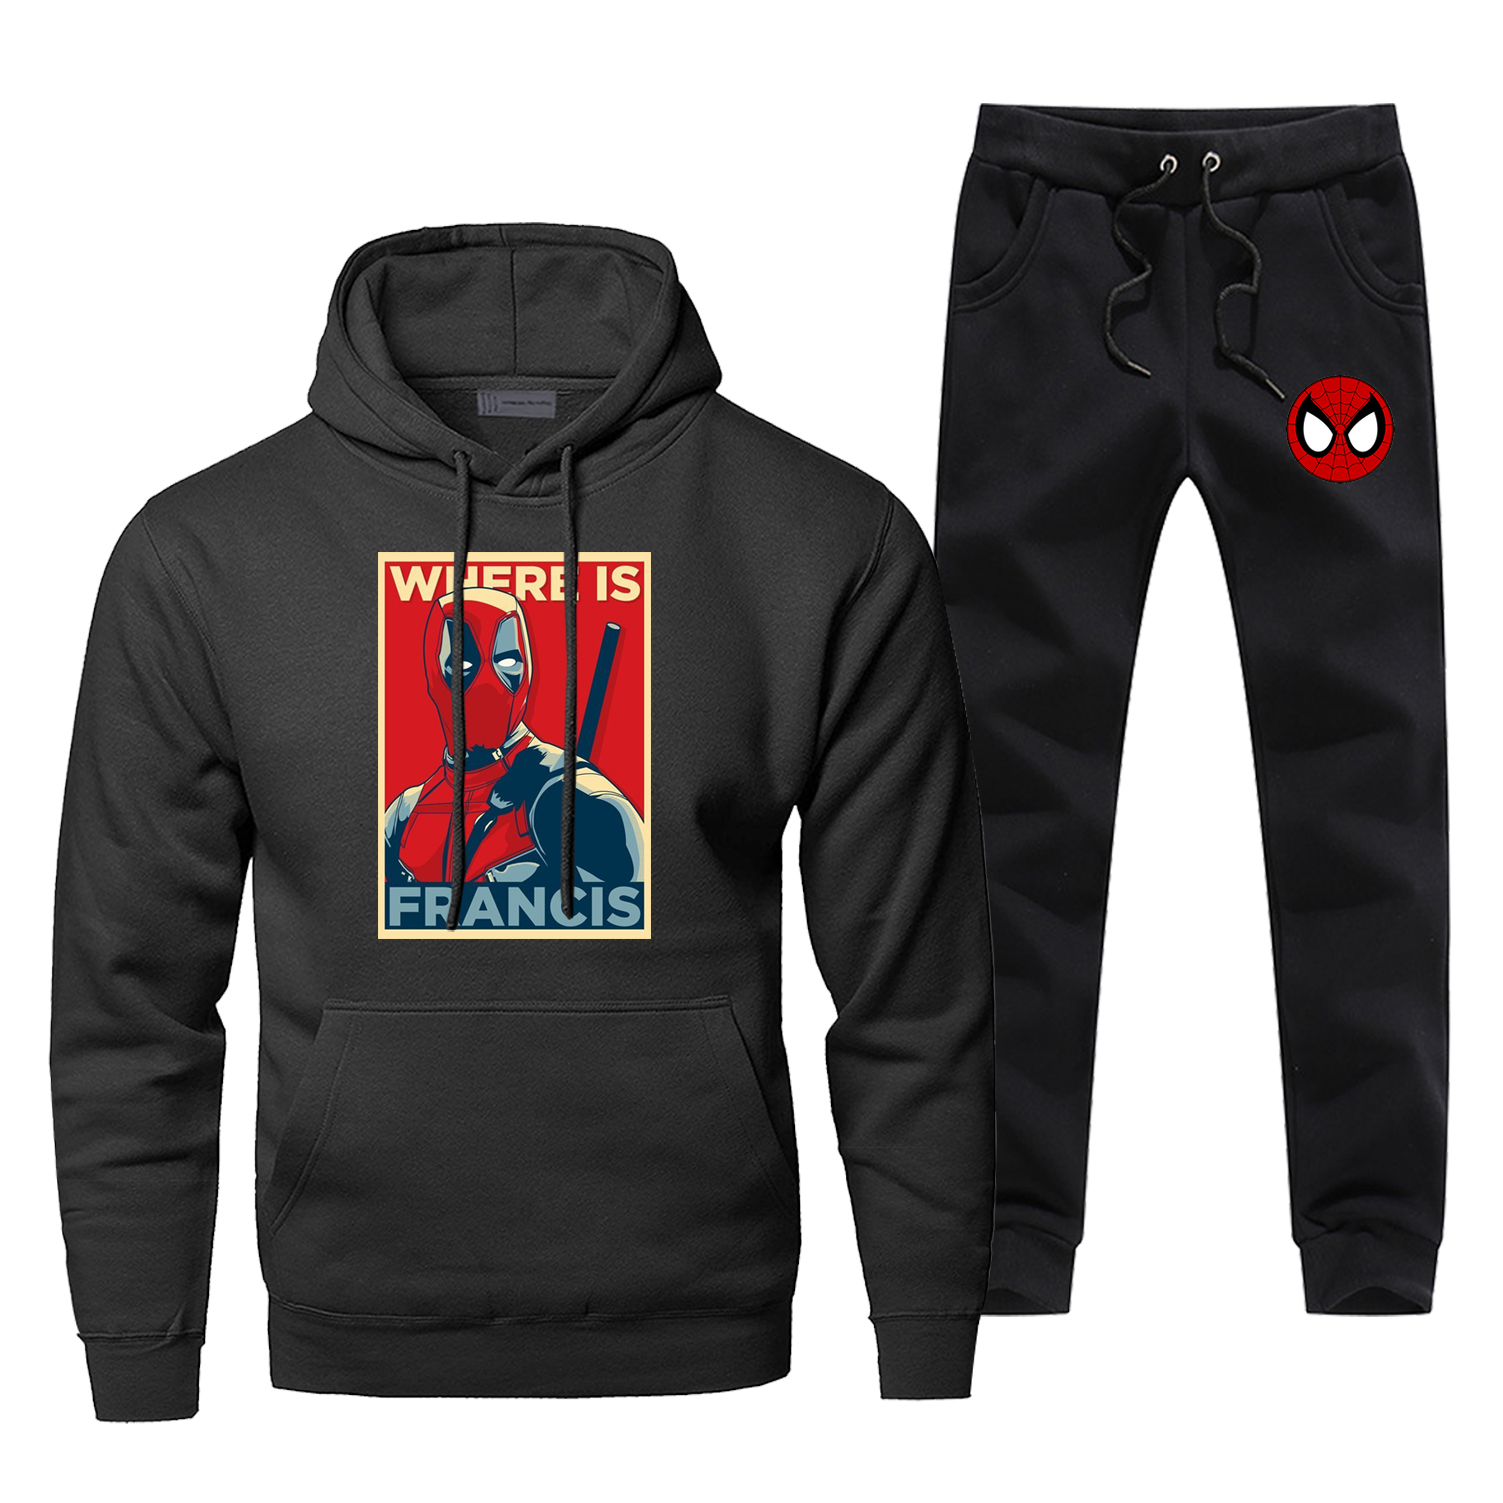 Deadpool Wade Winston Wilson Hoodies Pants Set Men Francis Funny Superhero Suit  Sweatshirt Sweatpants Pullover 2 PCS Tracksuit